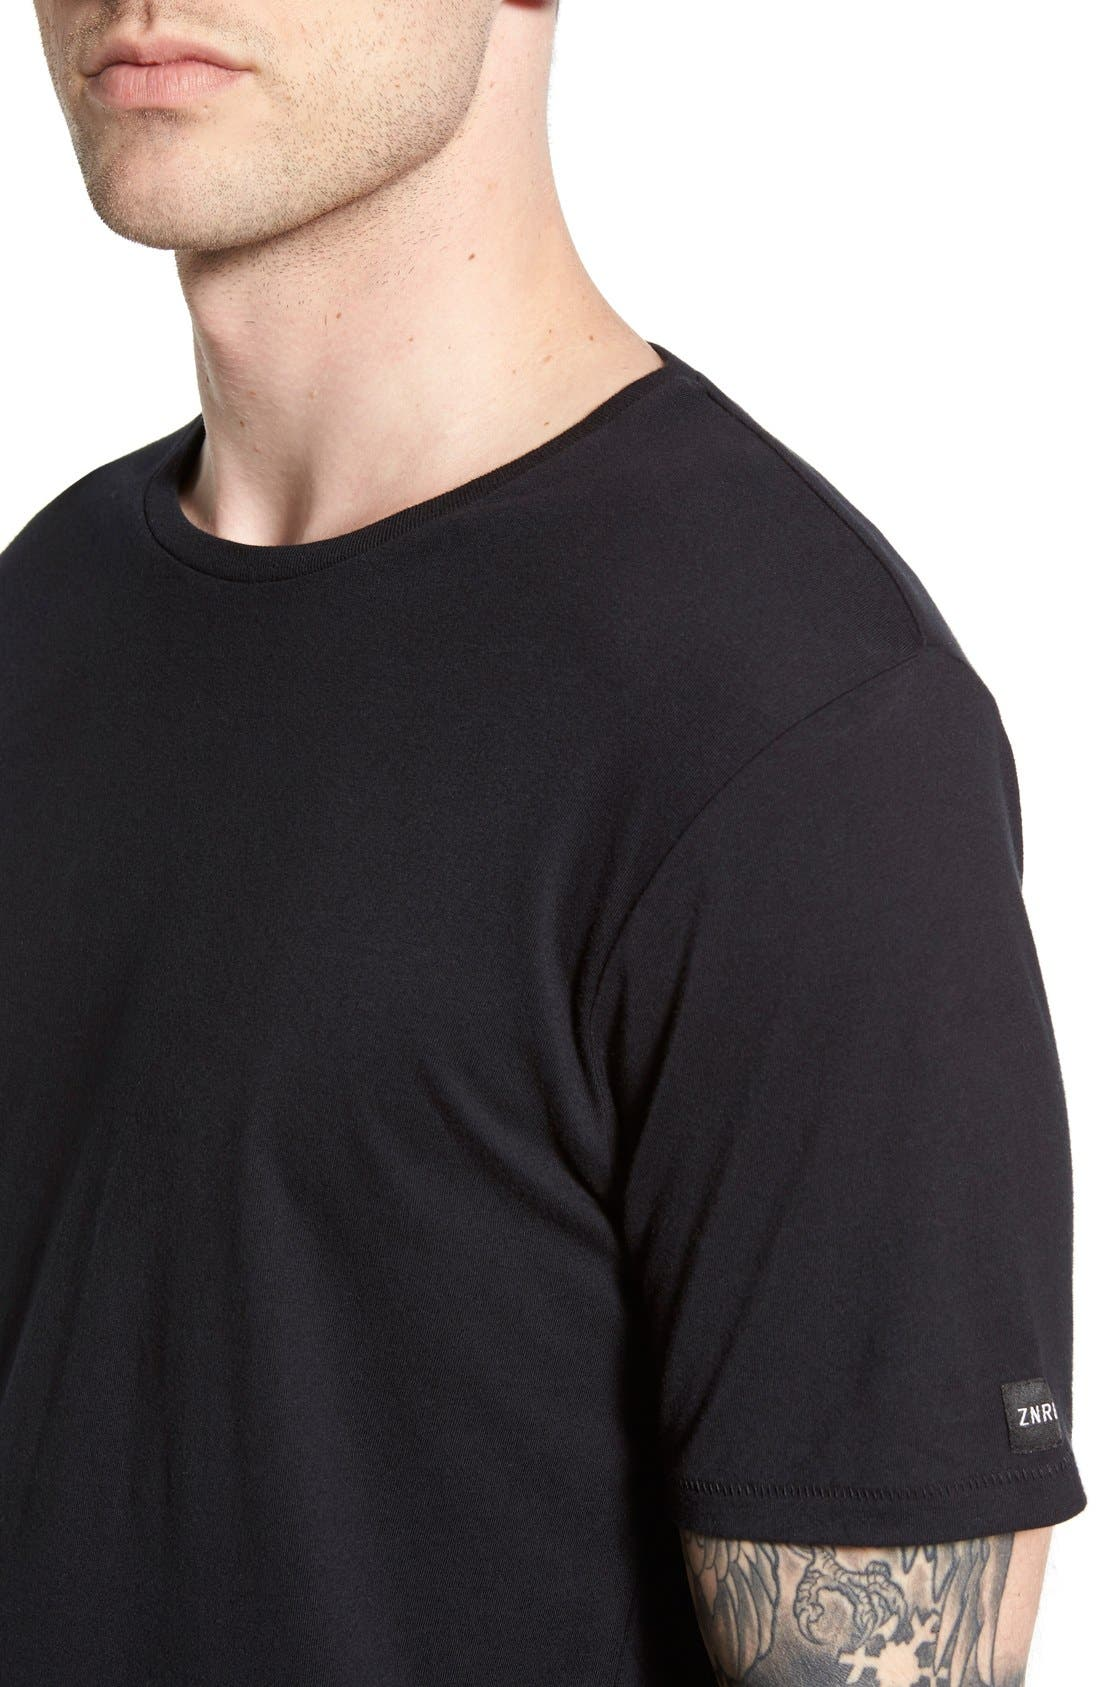 'Flintlock' Longline Crewneck T-Shirt,                             Alternate thumbnail 4, color,                             Black